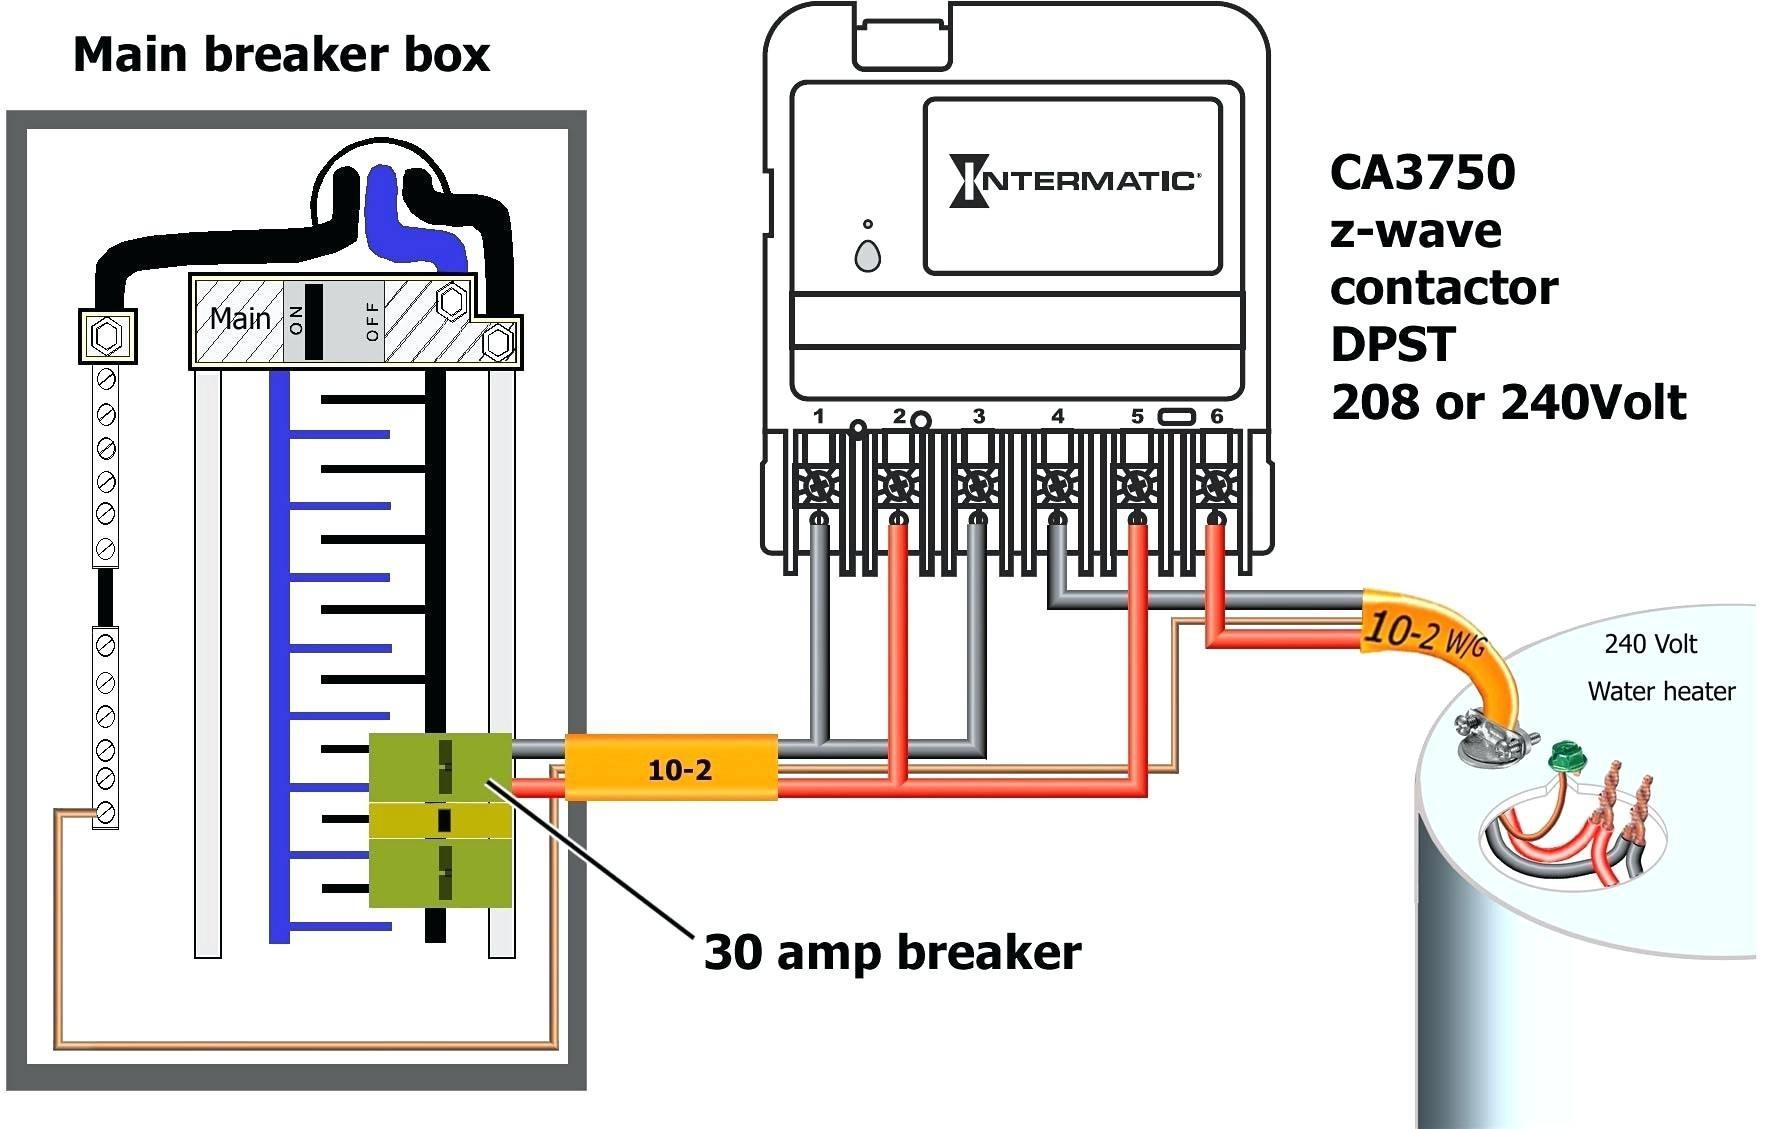 square d gfci breaker wiring diagram | free wiring diagram 220 gfci wiring diagram